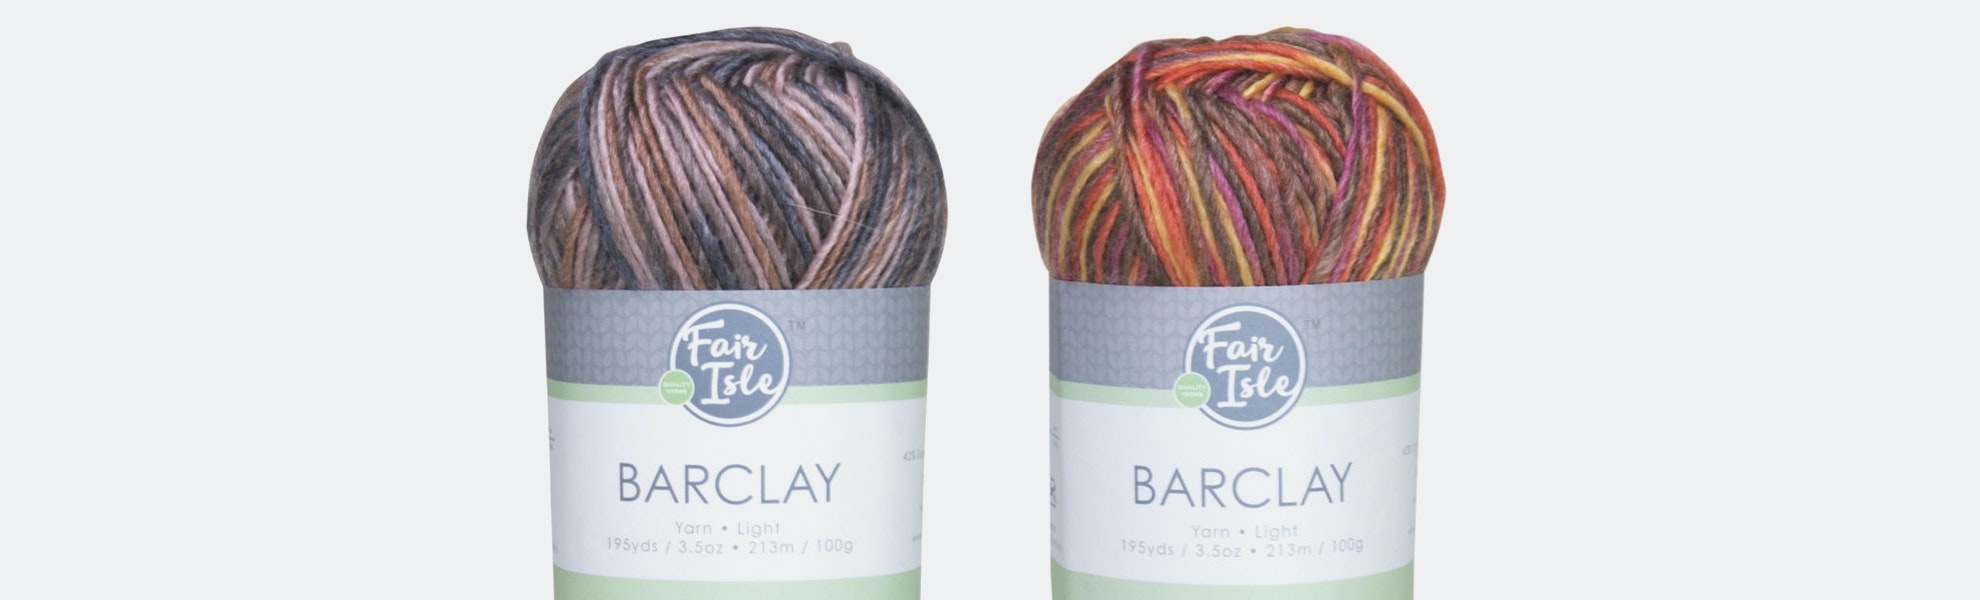 Barclay Yarn by Fair Isle (2-Pack)   Price & Reviews   Massdrop